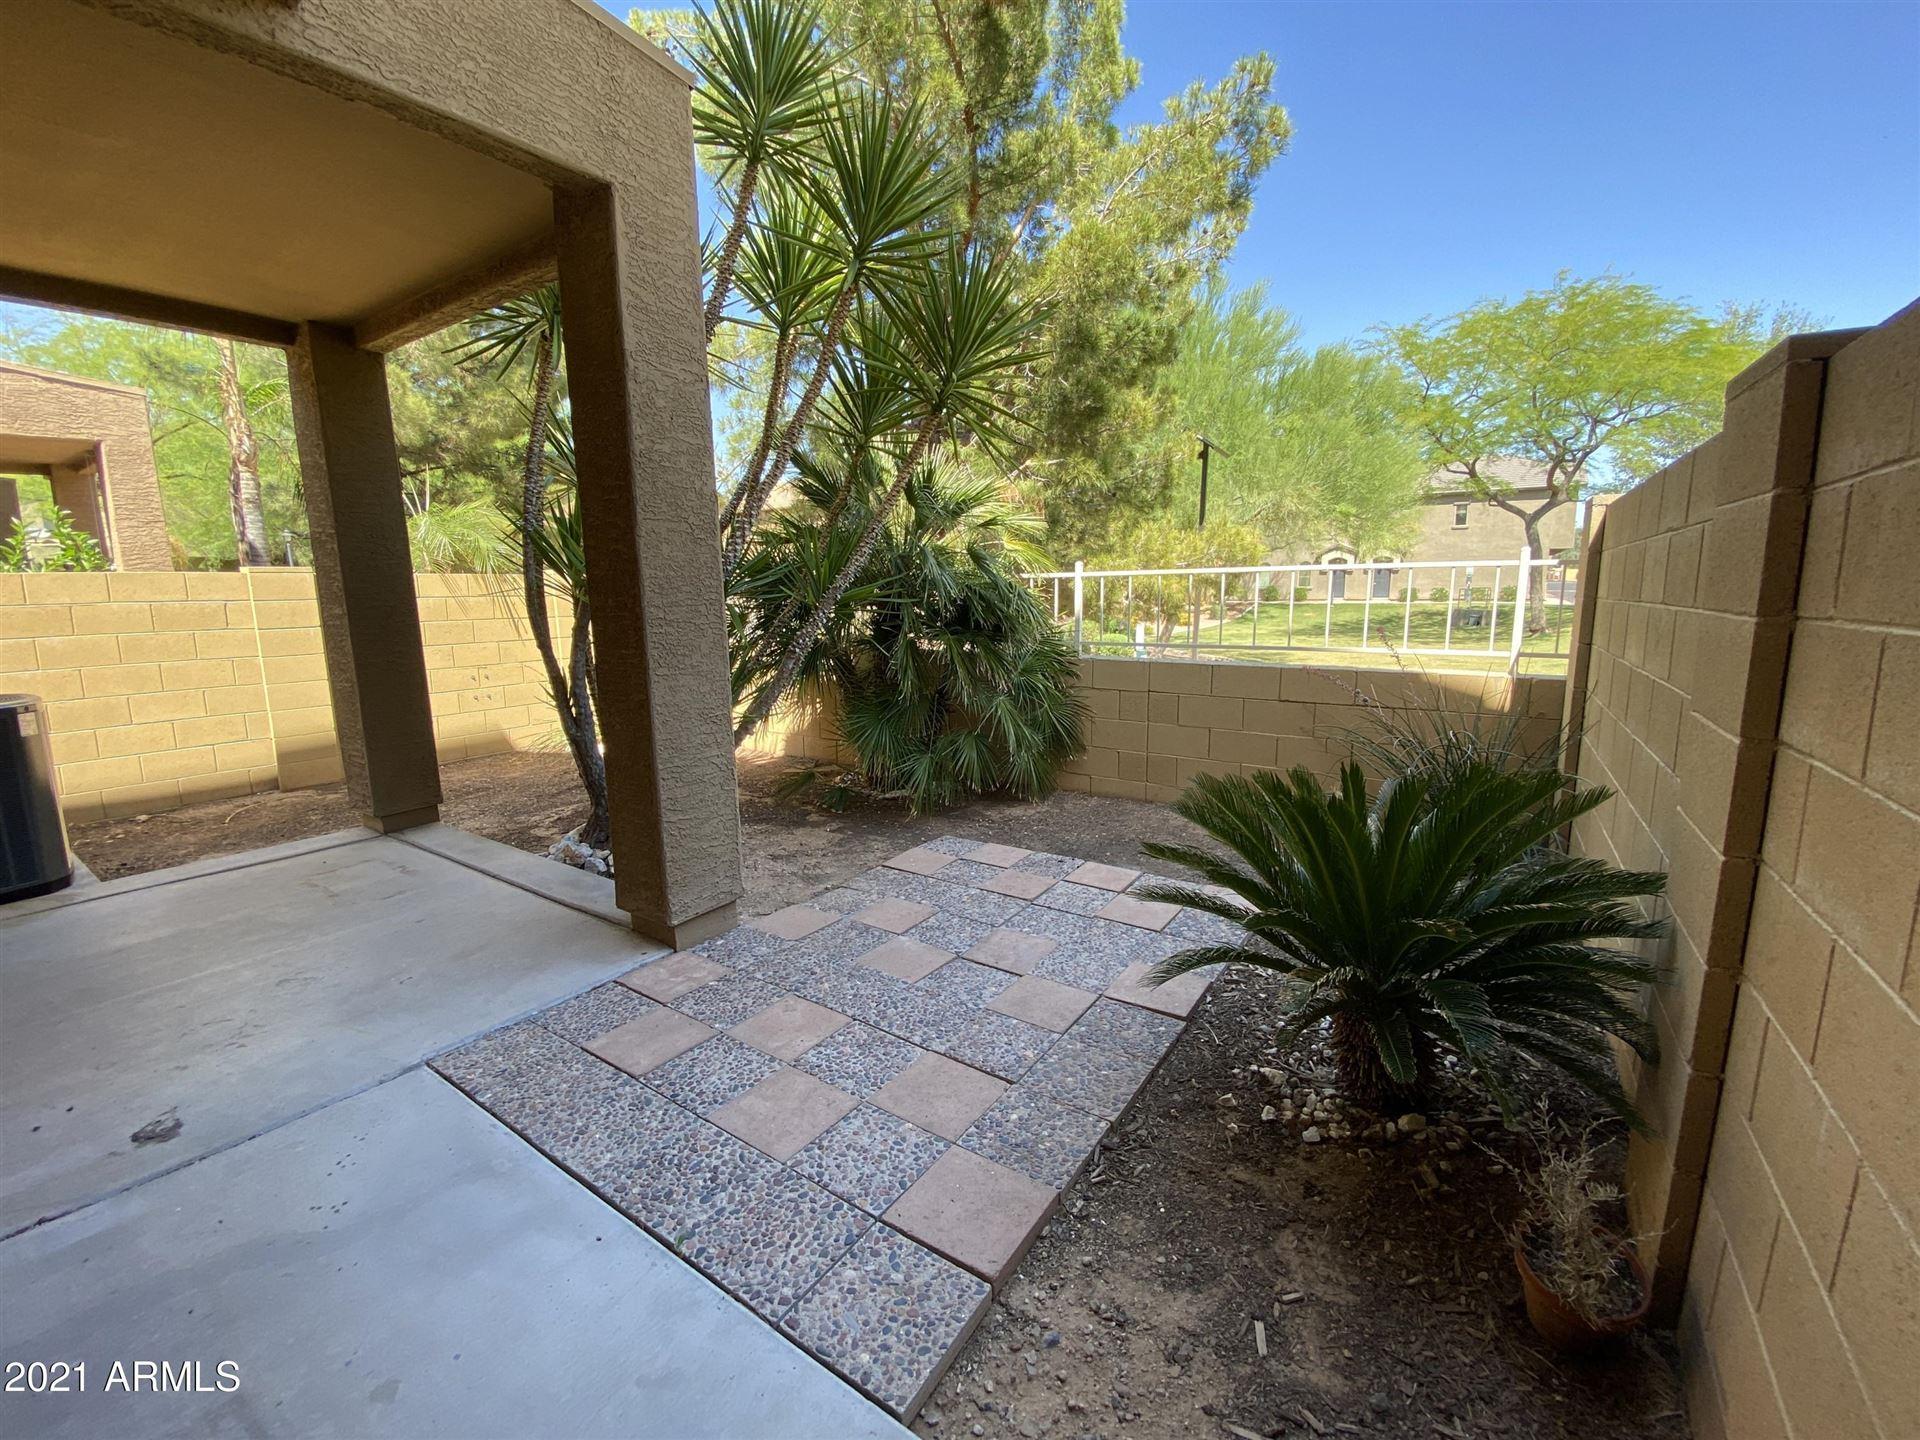 Photo of 2150 E BELL Road #1160, Phoenix, AZ 85022 (MLS # 6232147)